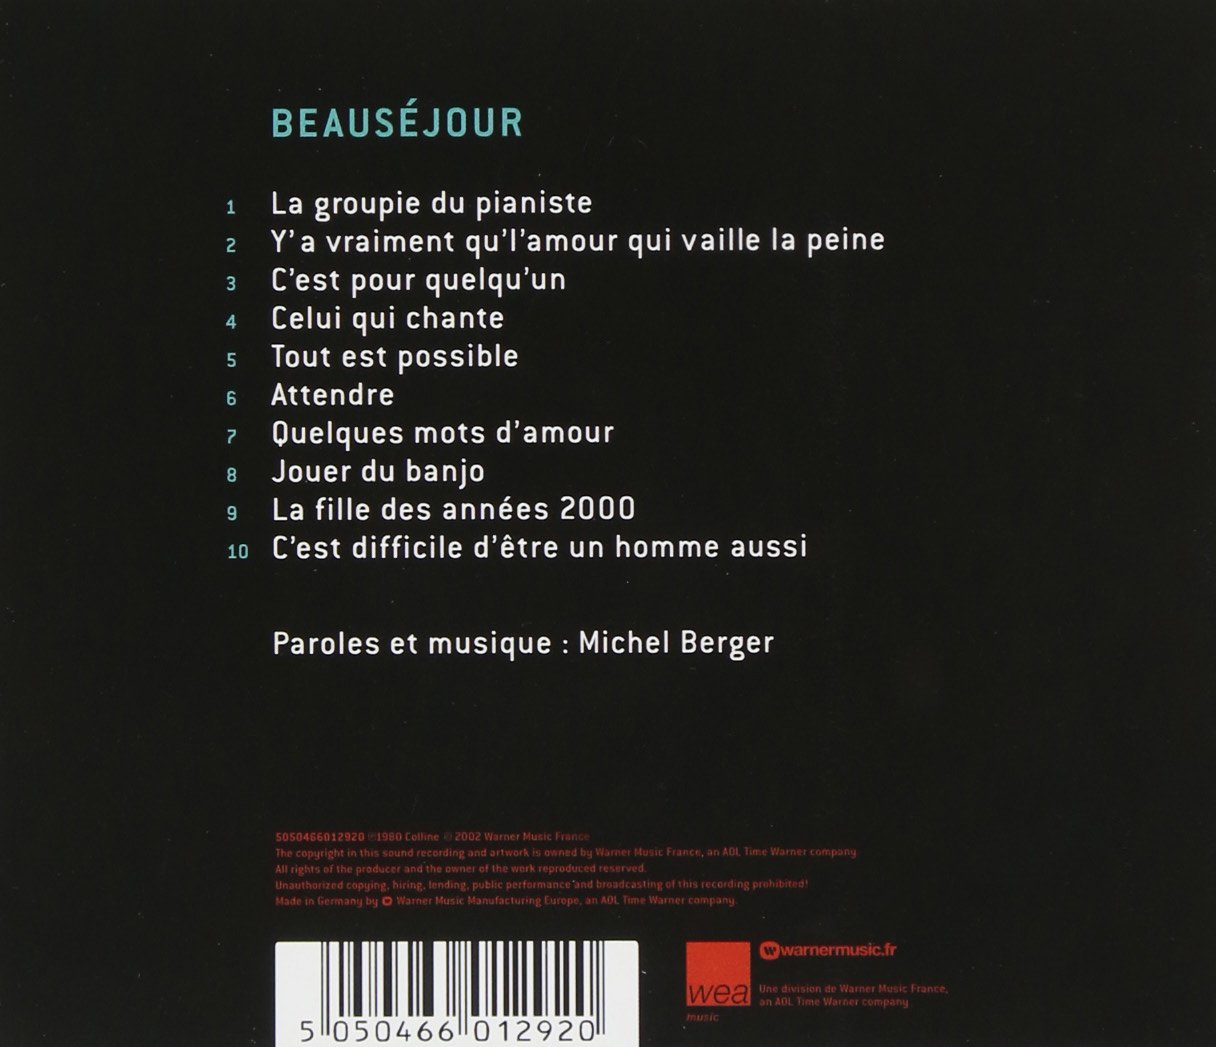 Amazoncom Beausejour Remastered Music